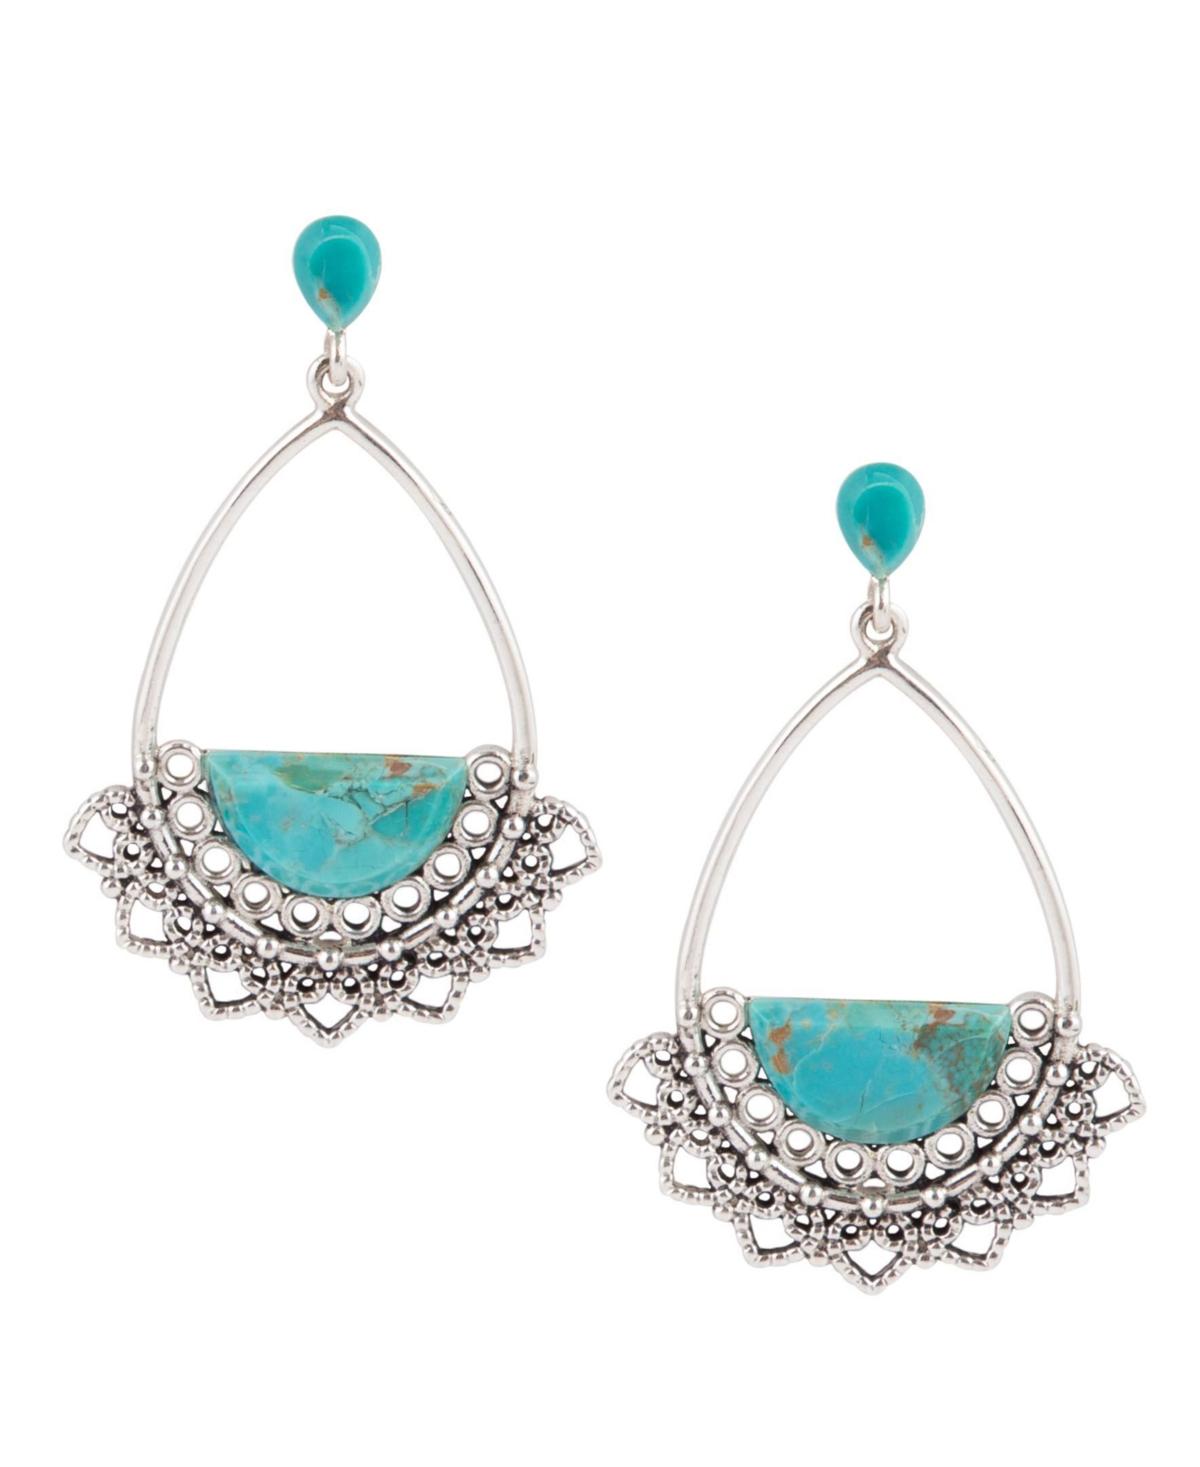 Barse Bazaar Statement Earrings